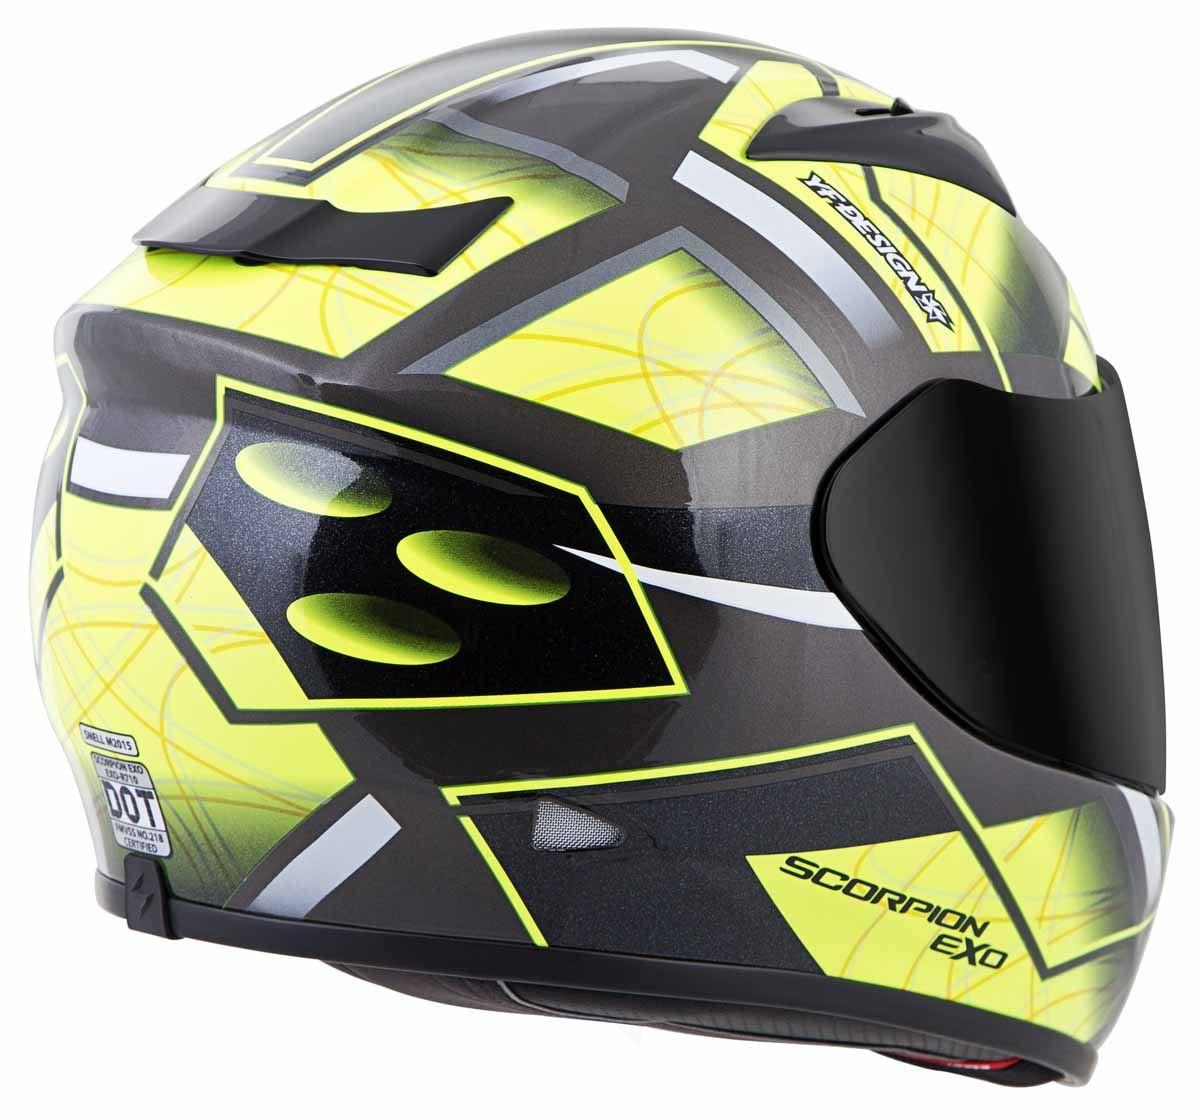 Scorpion-EXO-R710-Helmet-Fiberglass-Full-Face-DOT-SNELL-M2015-Certified-XS-2XL miniature 26